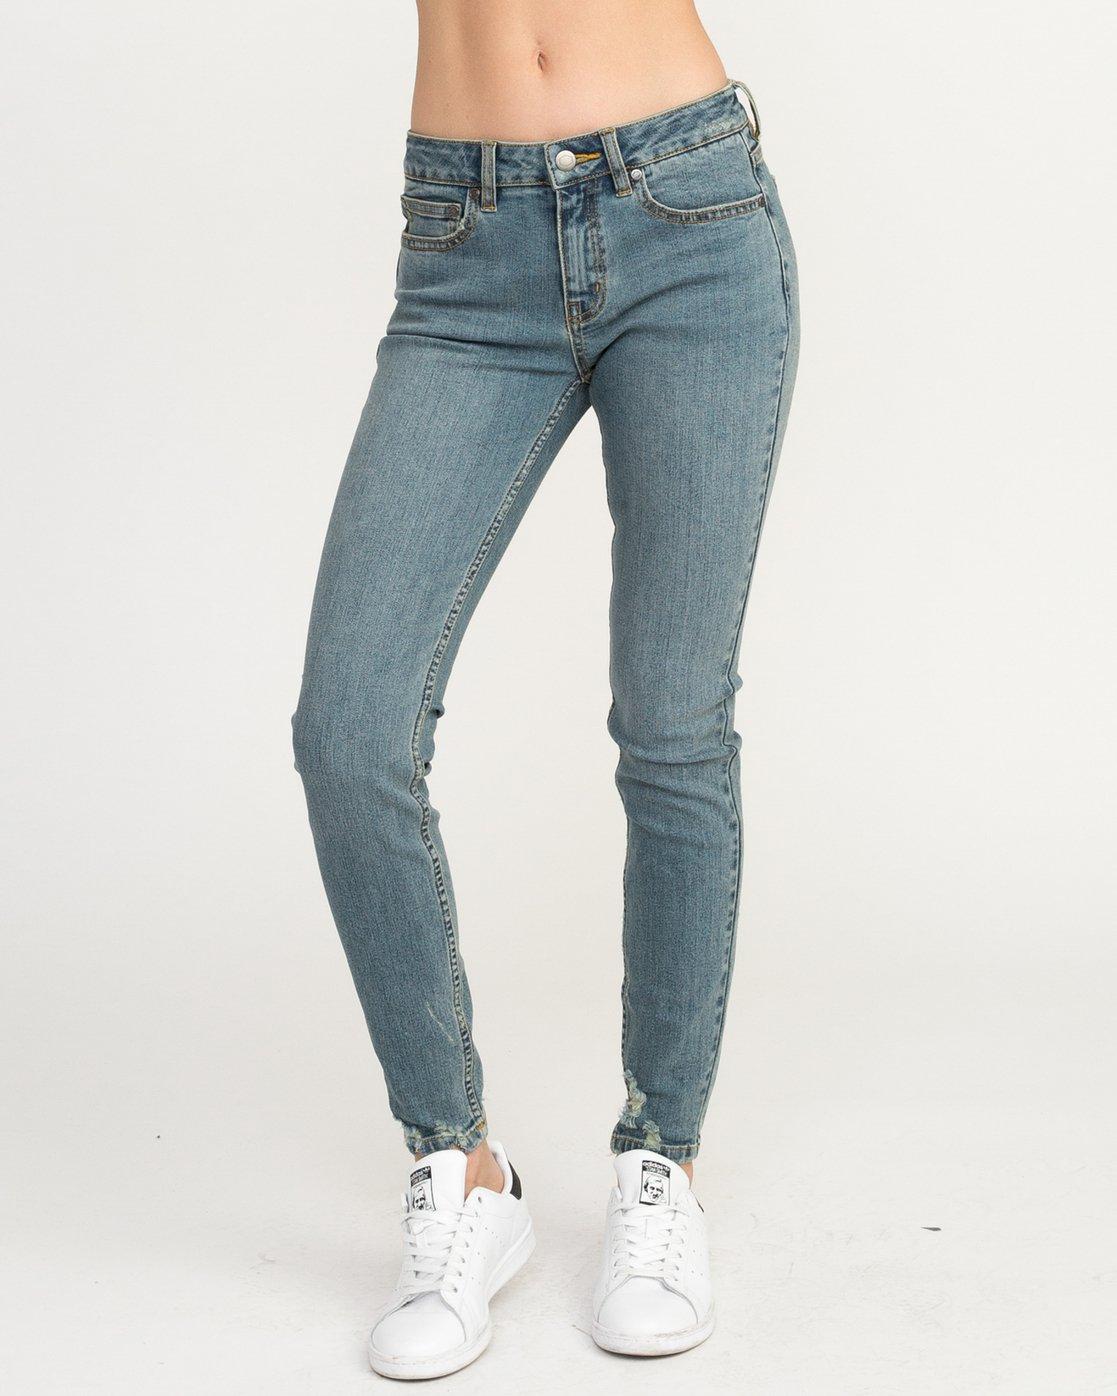 0 Dayley Mid Rise Denim Jeans Blue WCDP02DA RVCA